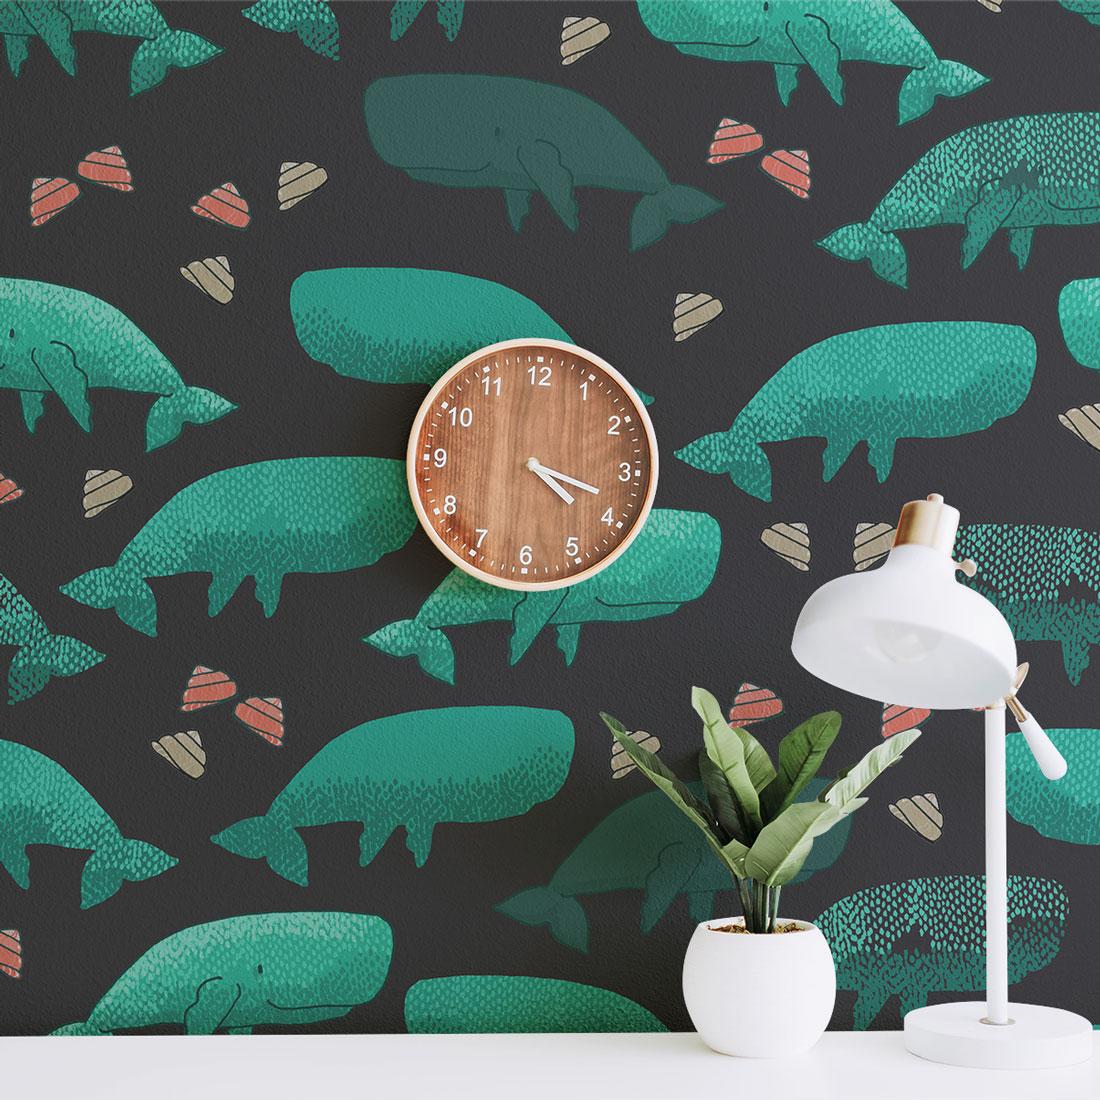 pr-apt-wallpaper-balene-square